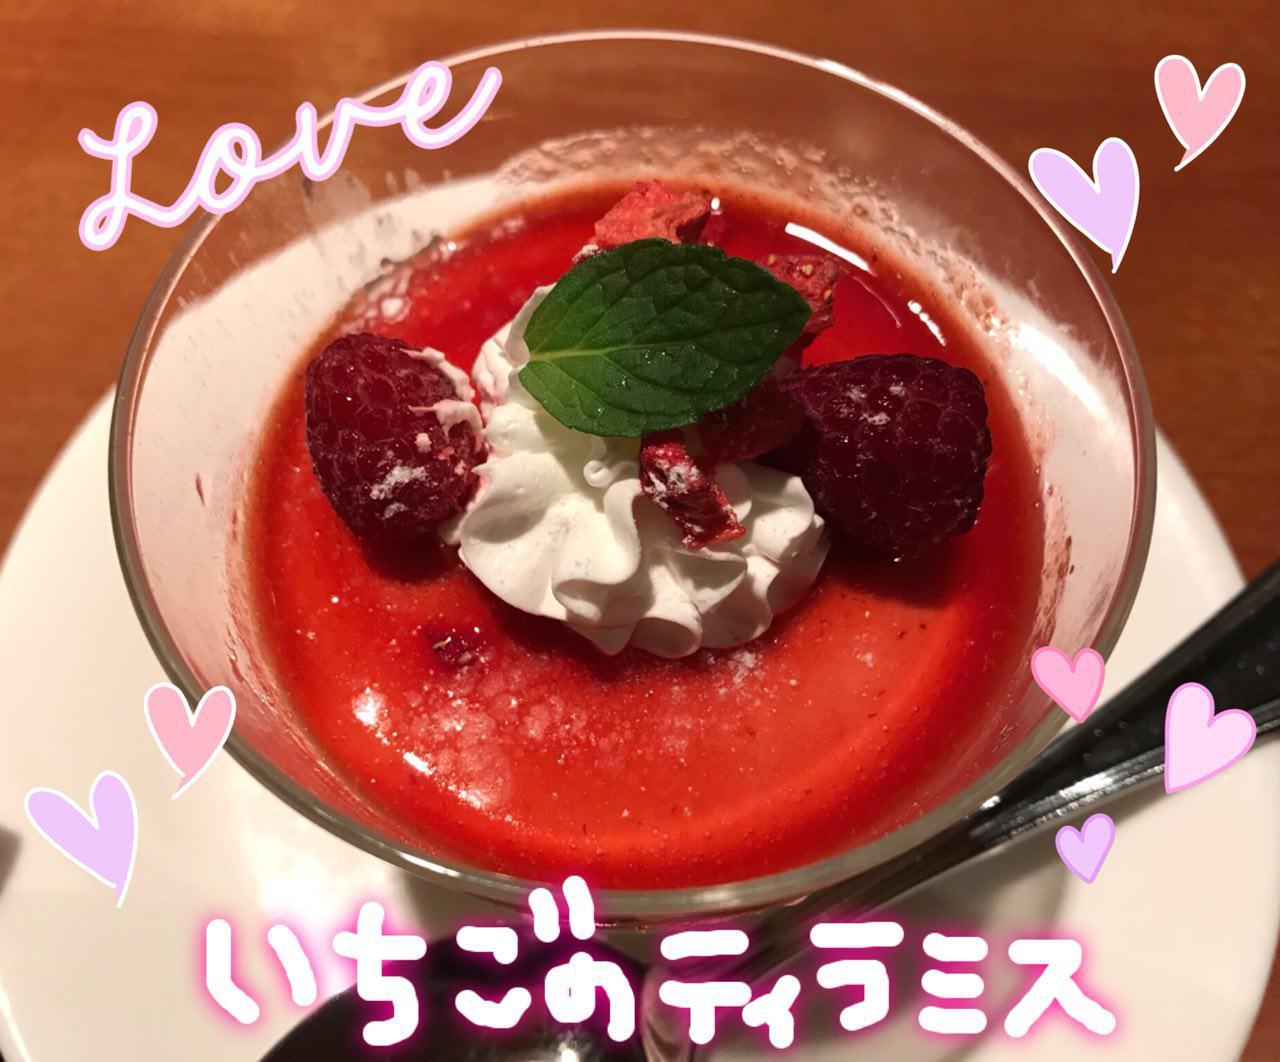 photo_2018-03-26_20-48-04.jpg